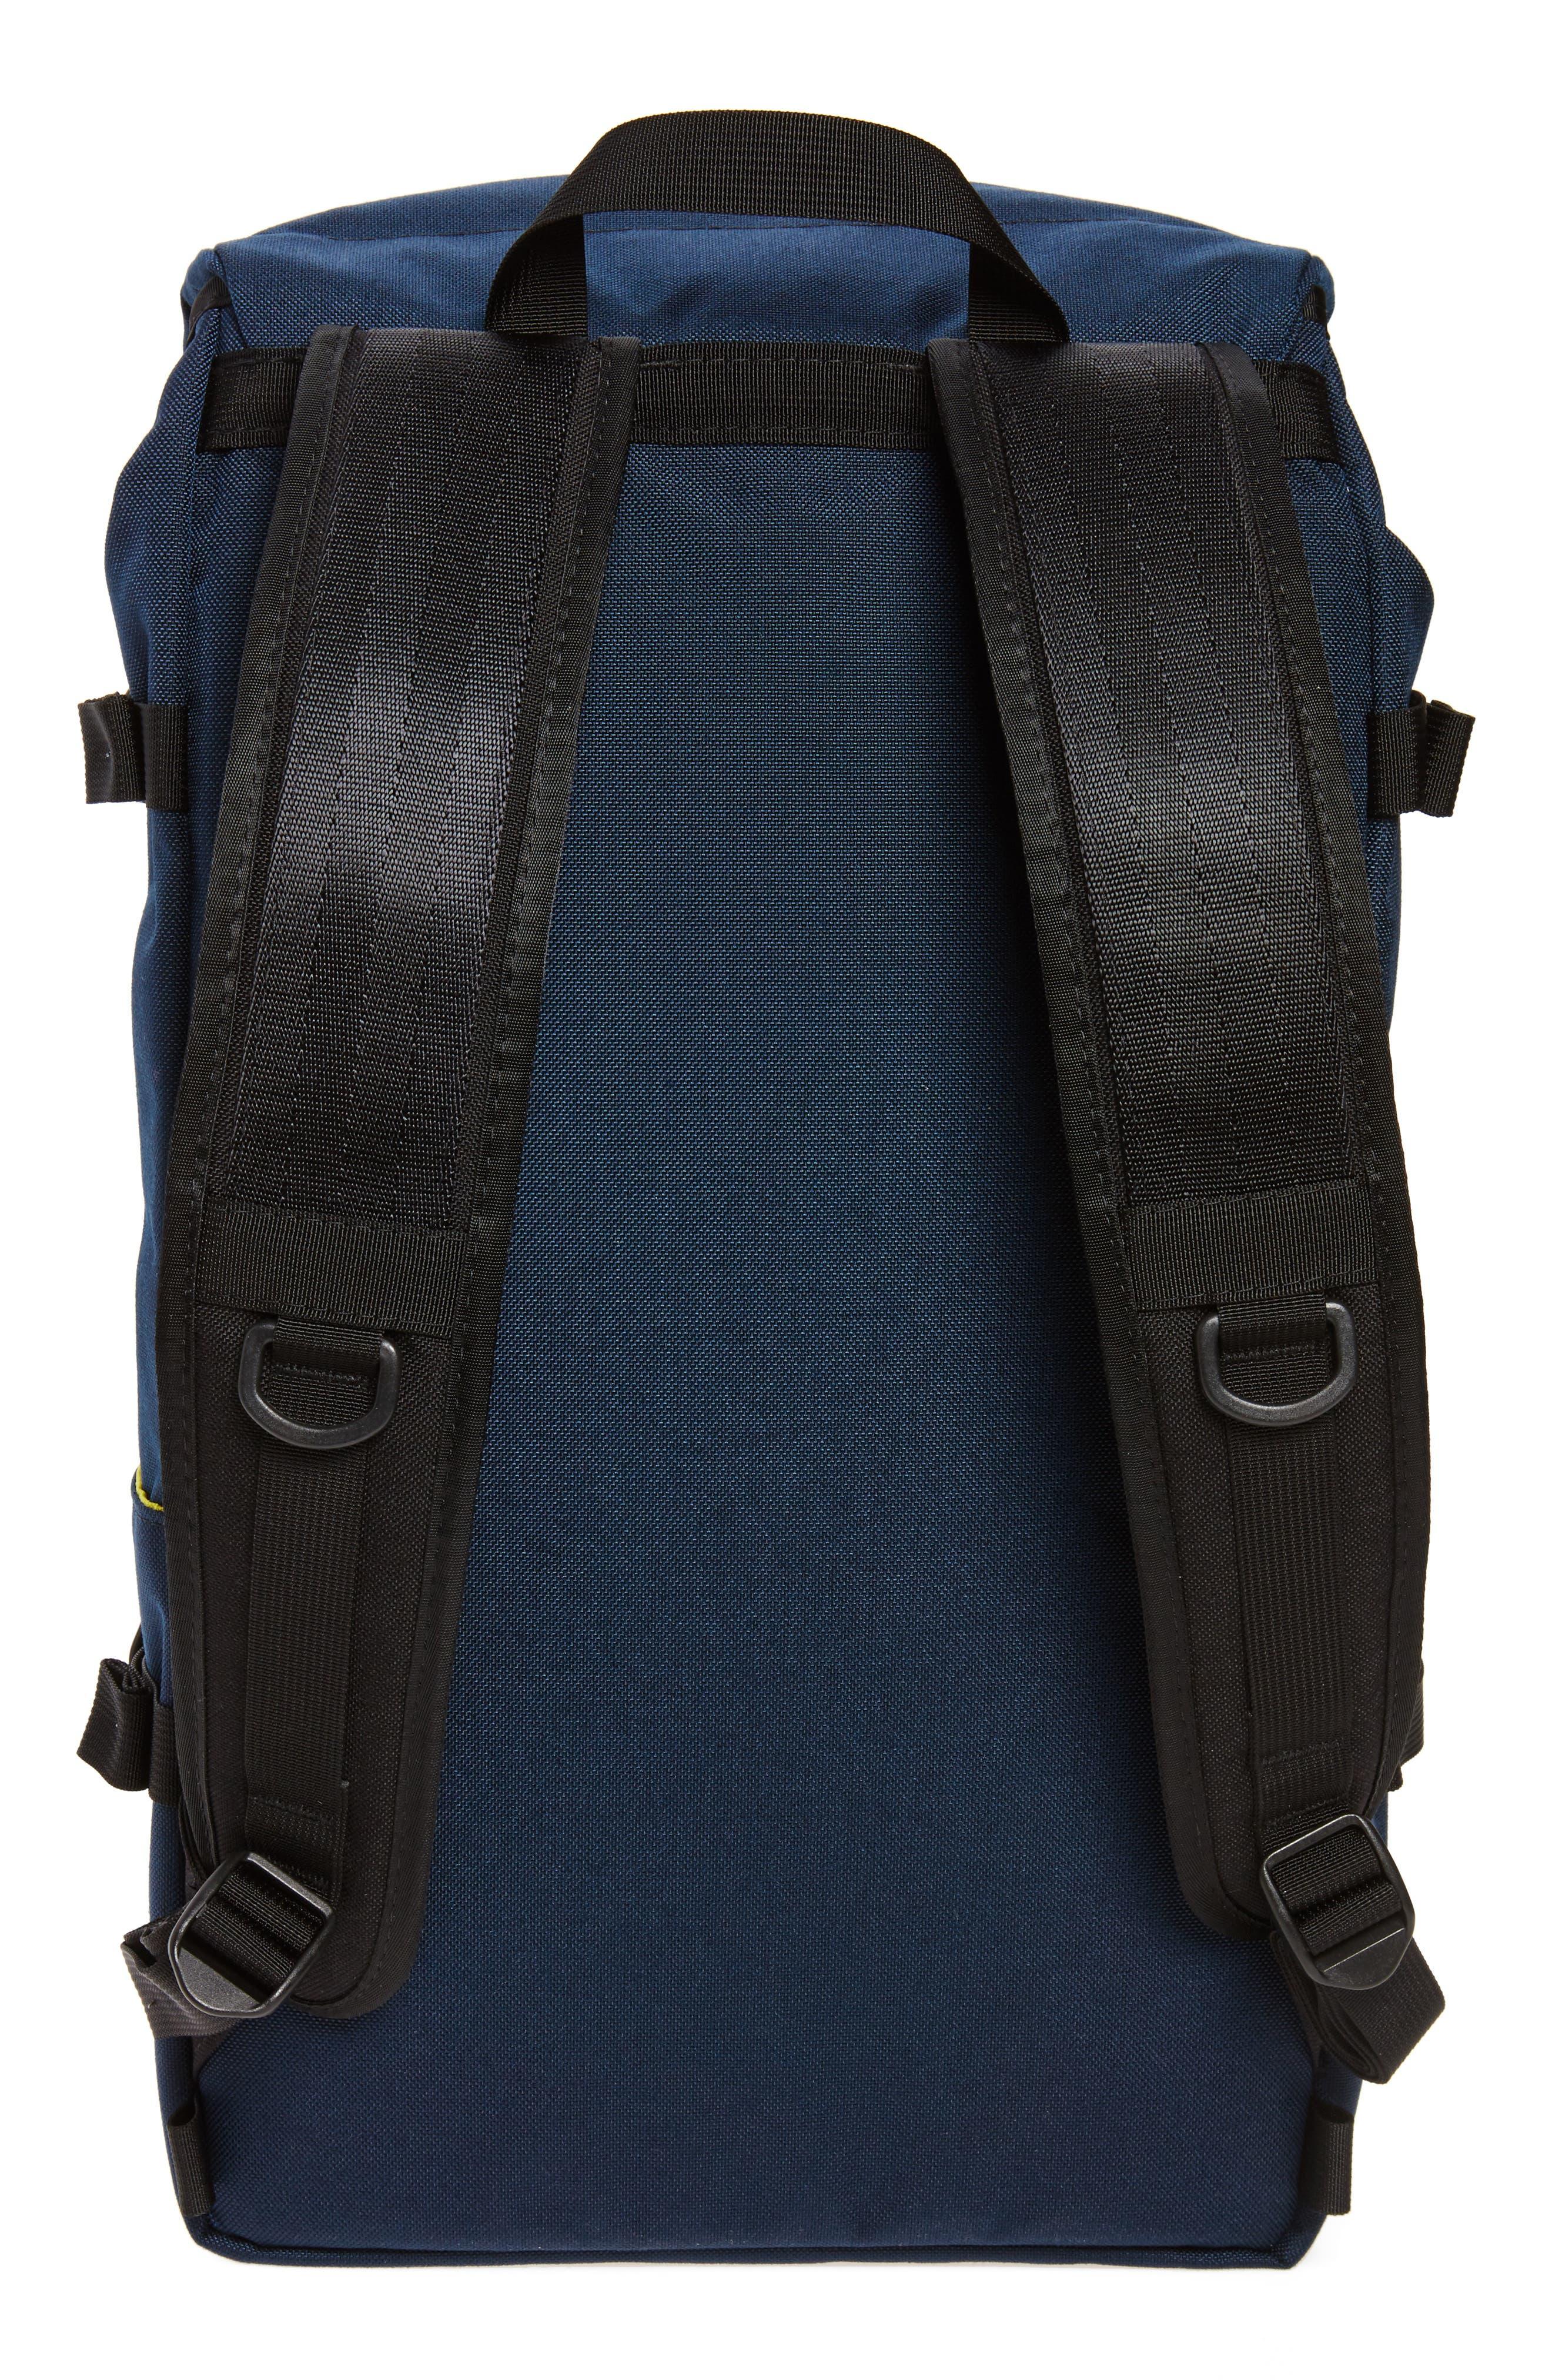 'Klettersack' Backpack,                             Alternate thumbnail 3, color,                             Navy